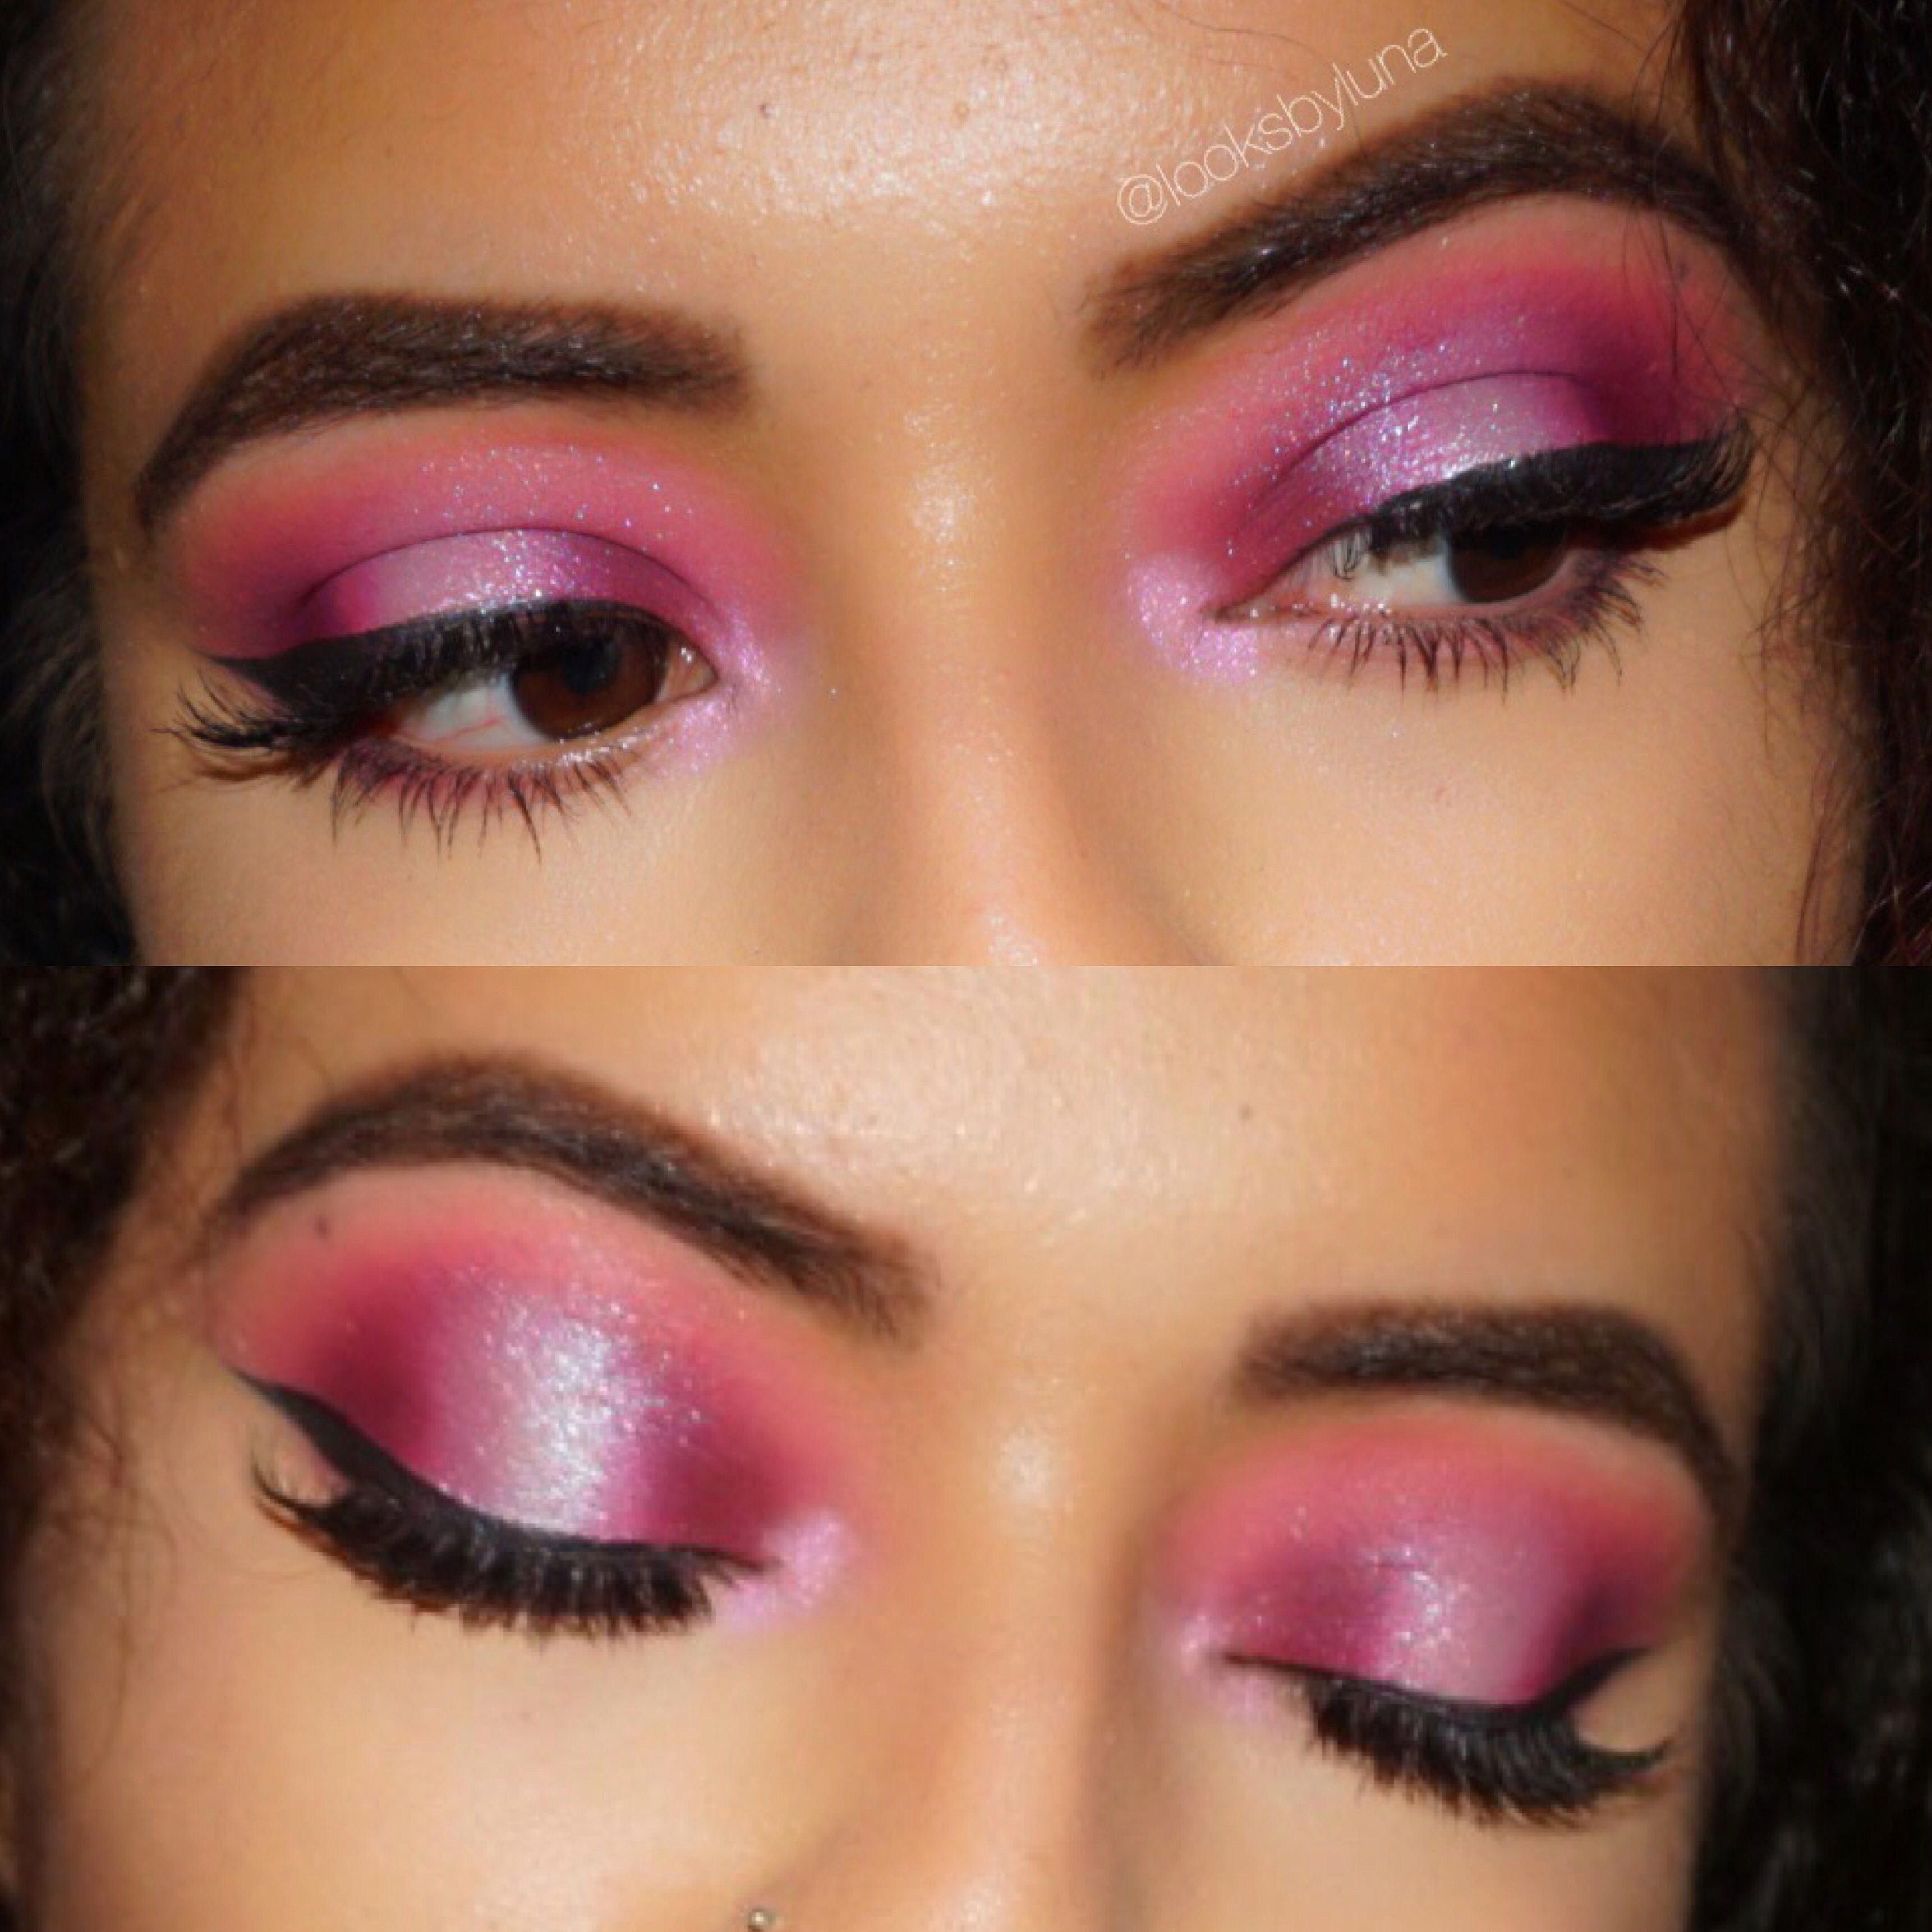 Colourpop element of surprise palette. Hooded eyes makeup